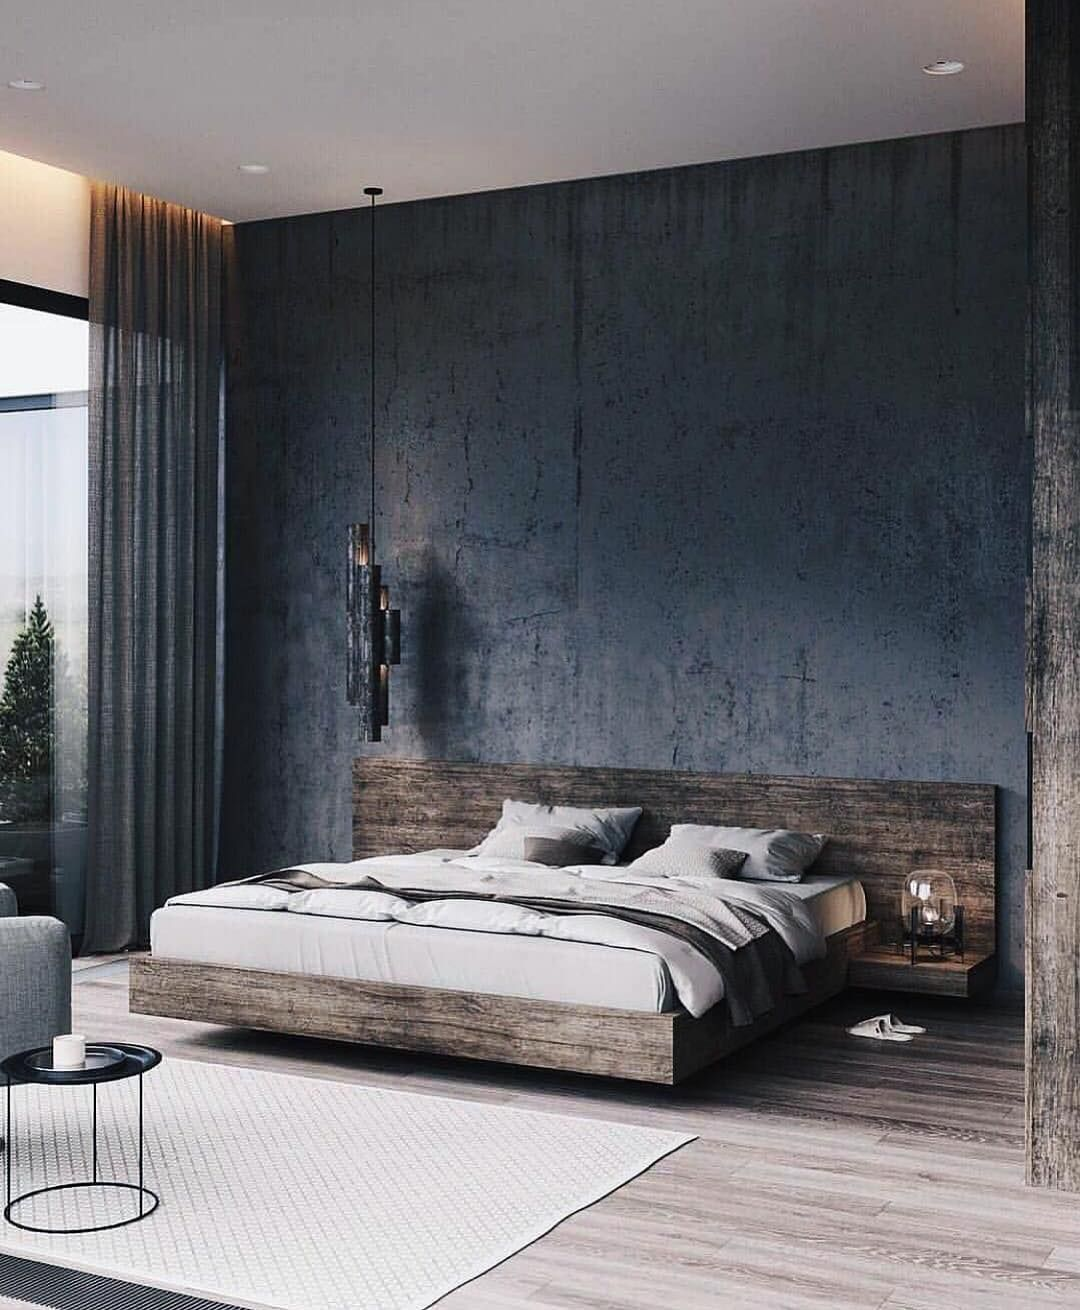 Modern Architecture Bedroom Design 5 in 5  Industrial